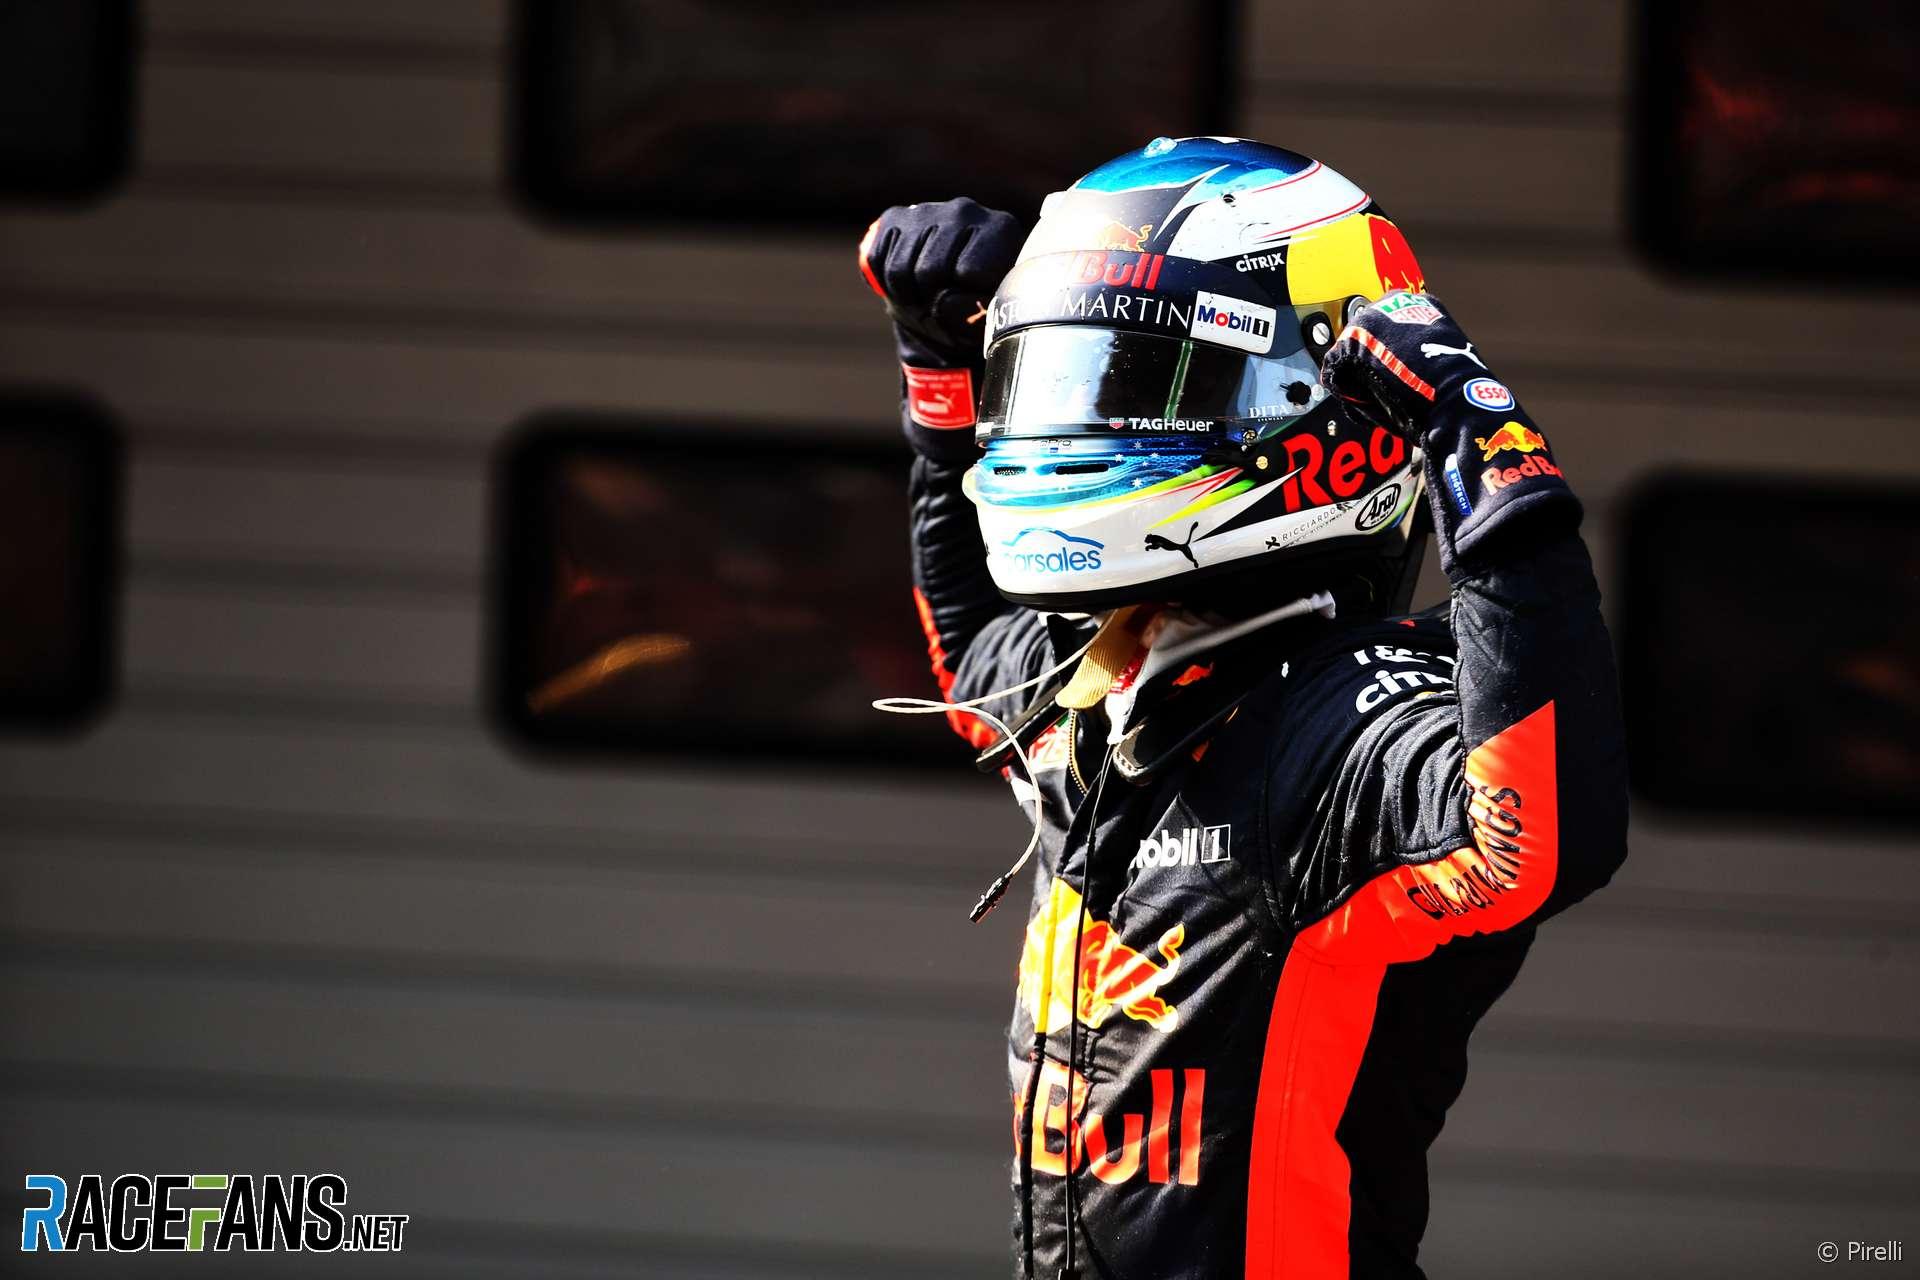 Daniel Ricciardo, Red Bull, Shanghai International Circuit, 2018